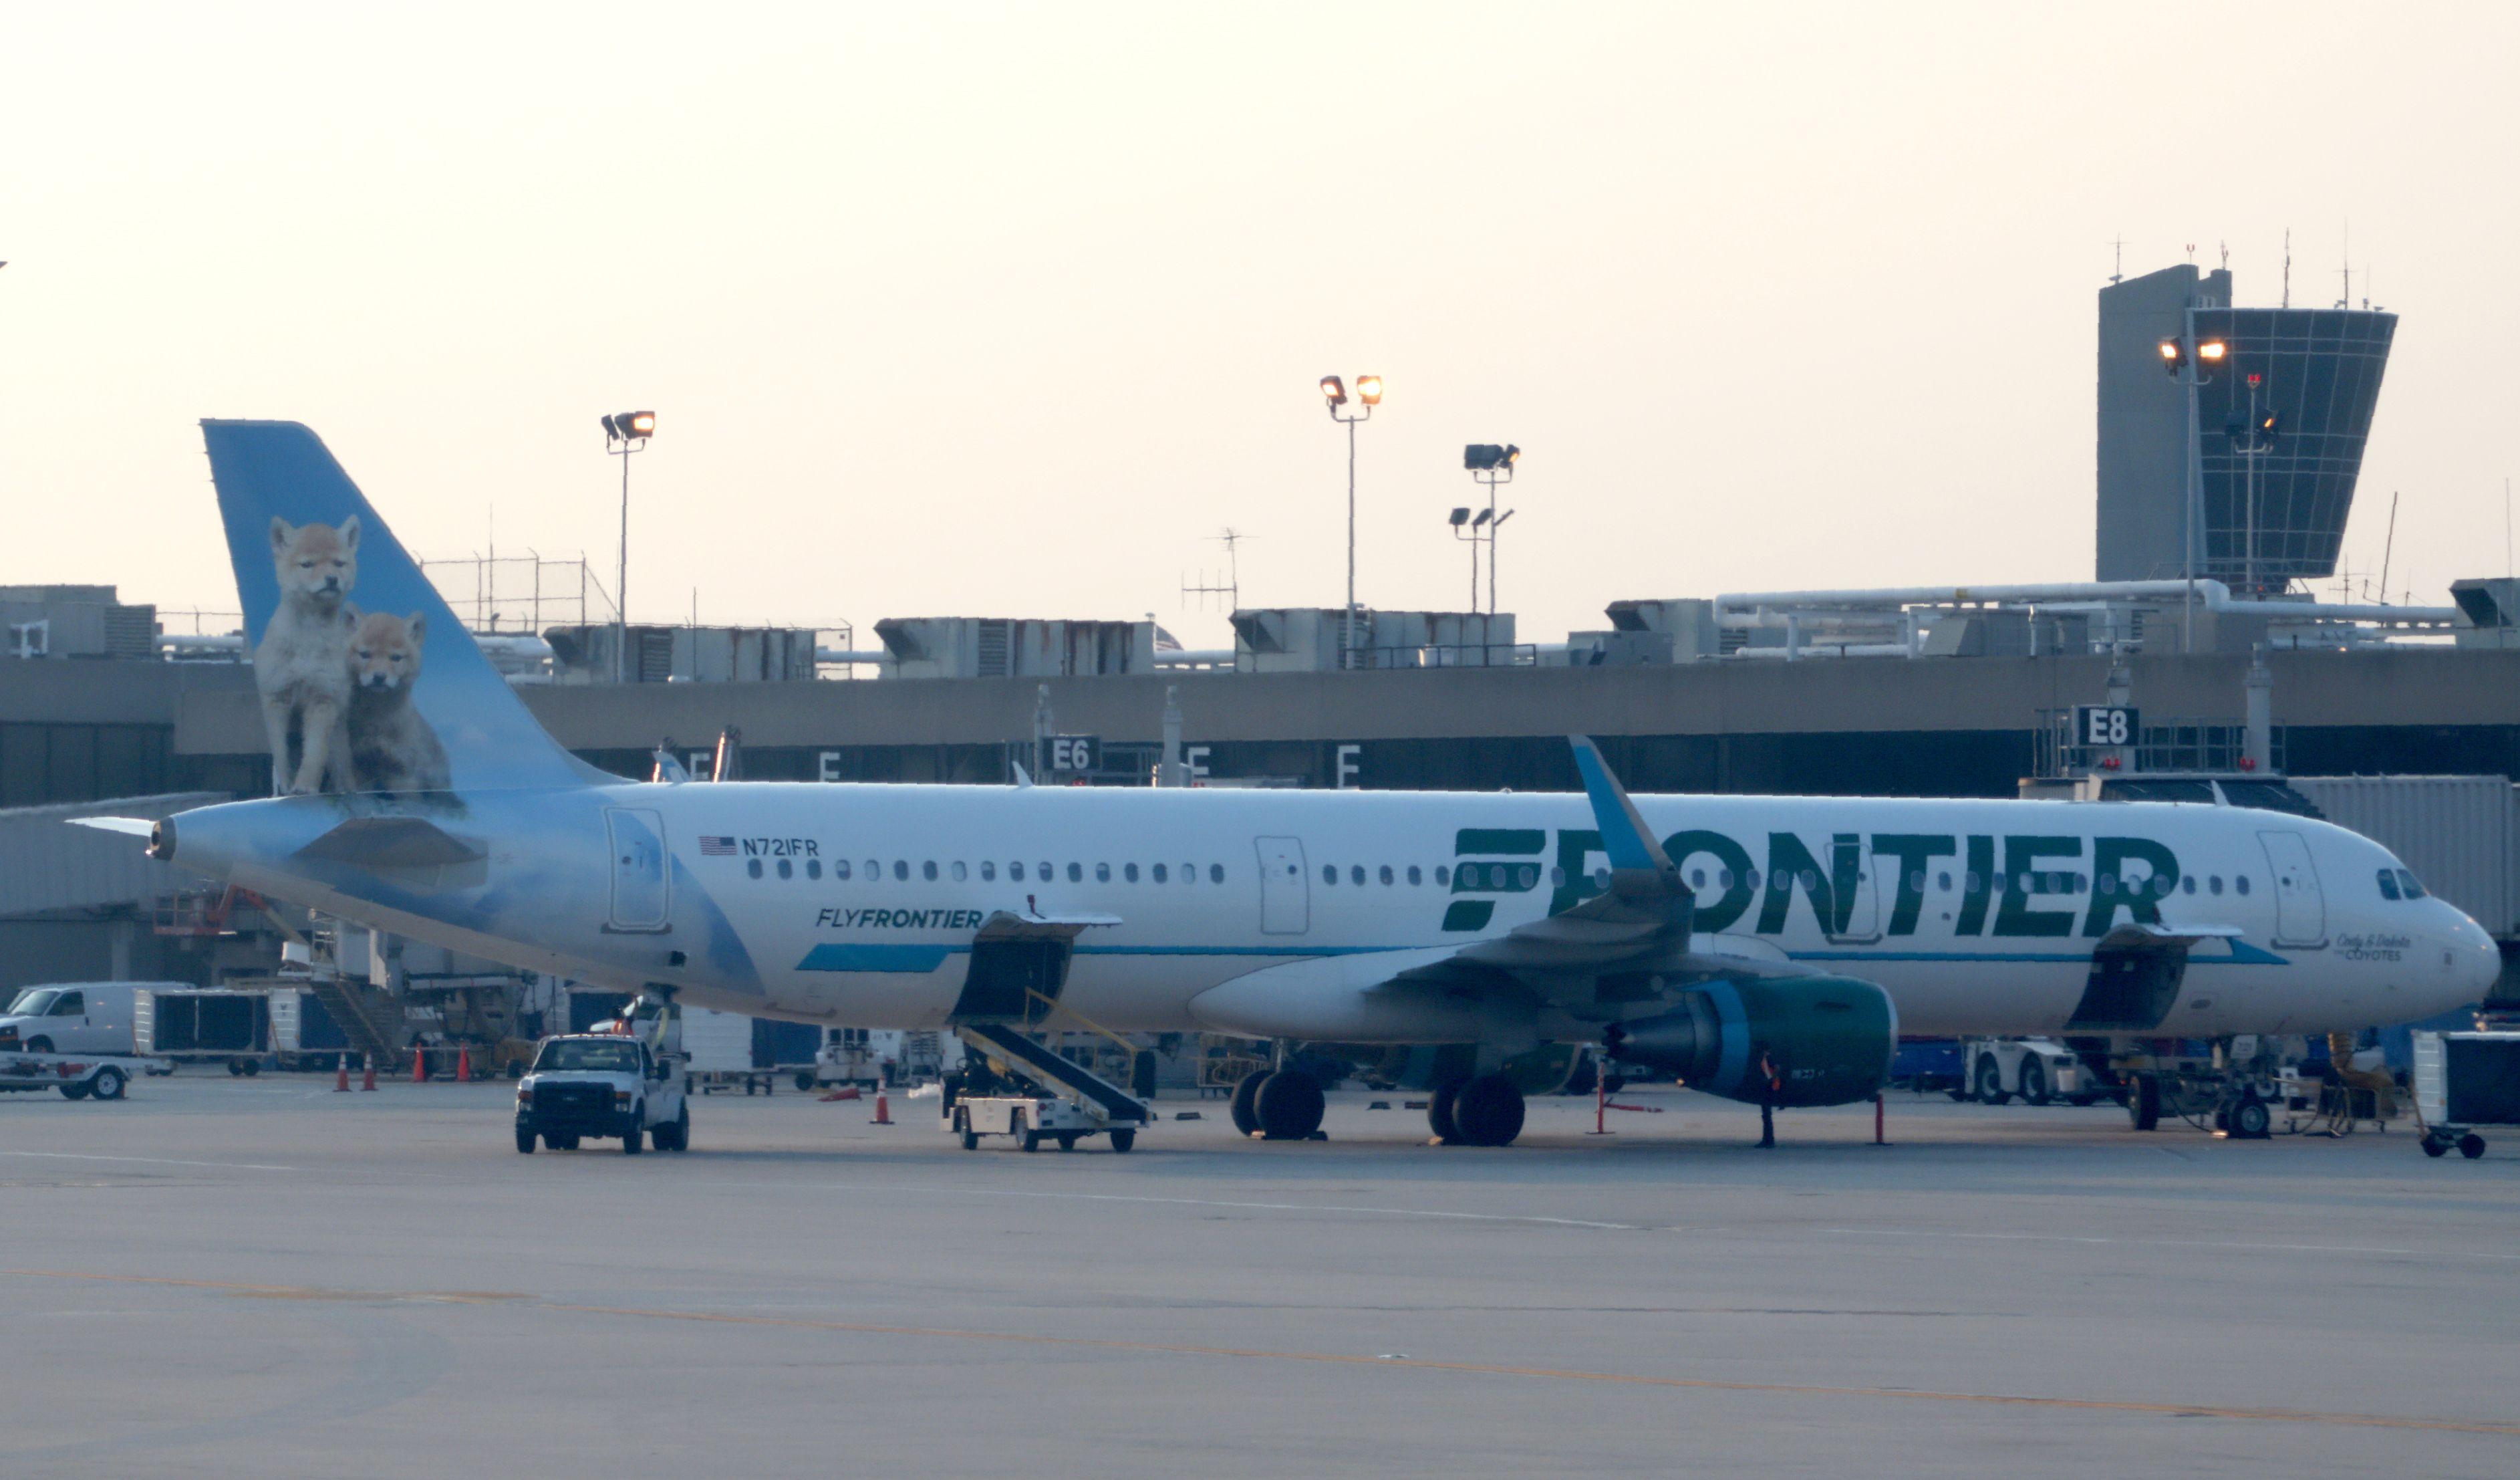 A Frontier Airlines jet at Philadelphia International Airport on June 1, 2018, in Philadelphia, Pennsylvania.